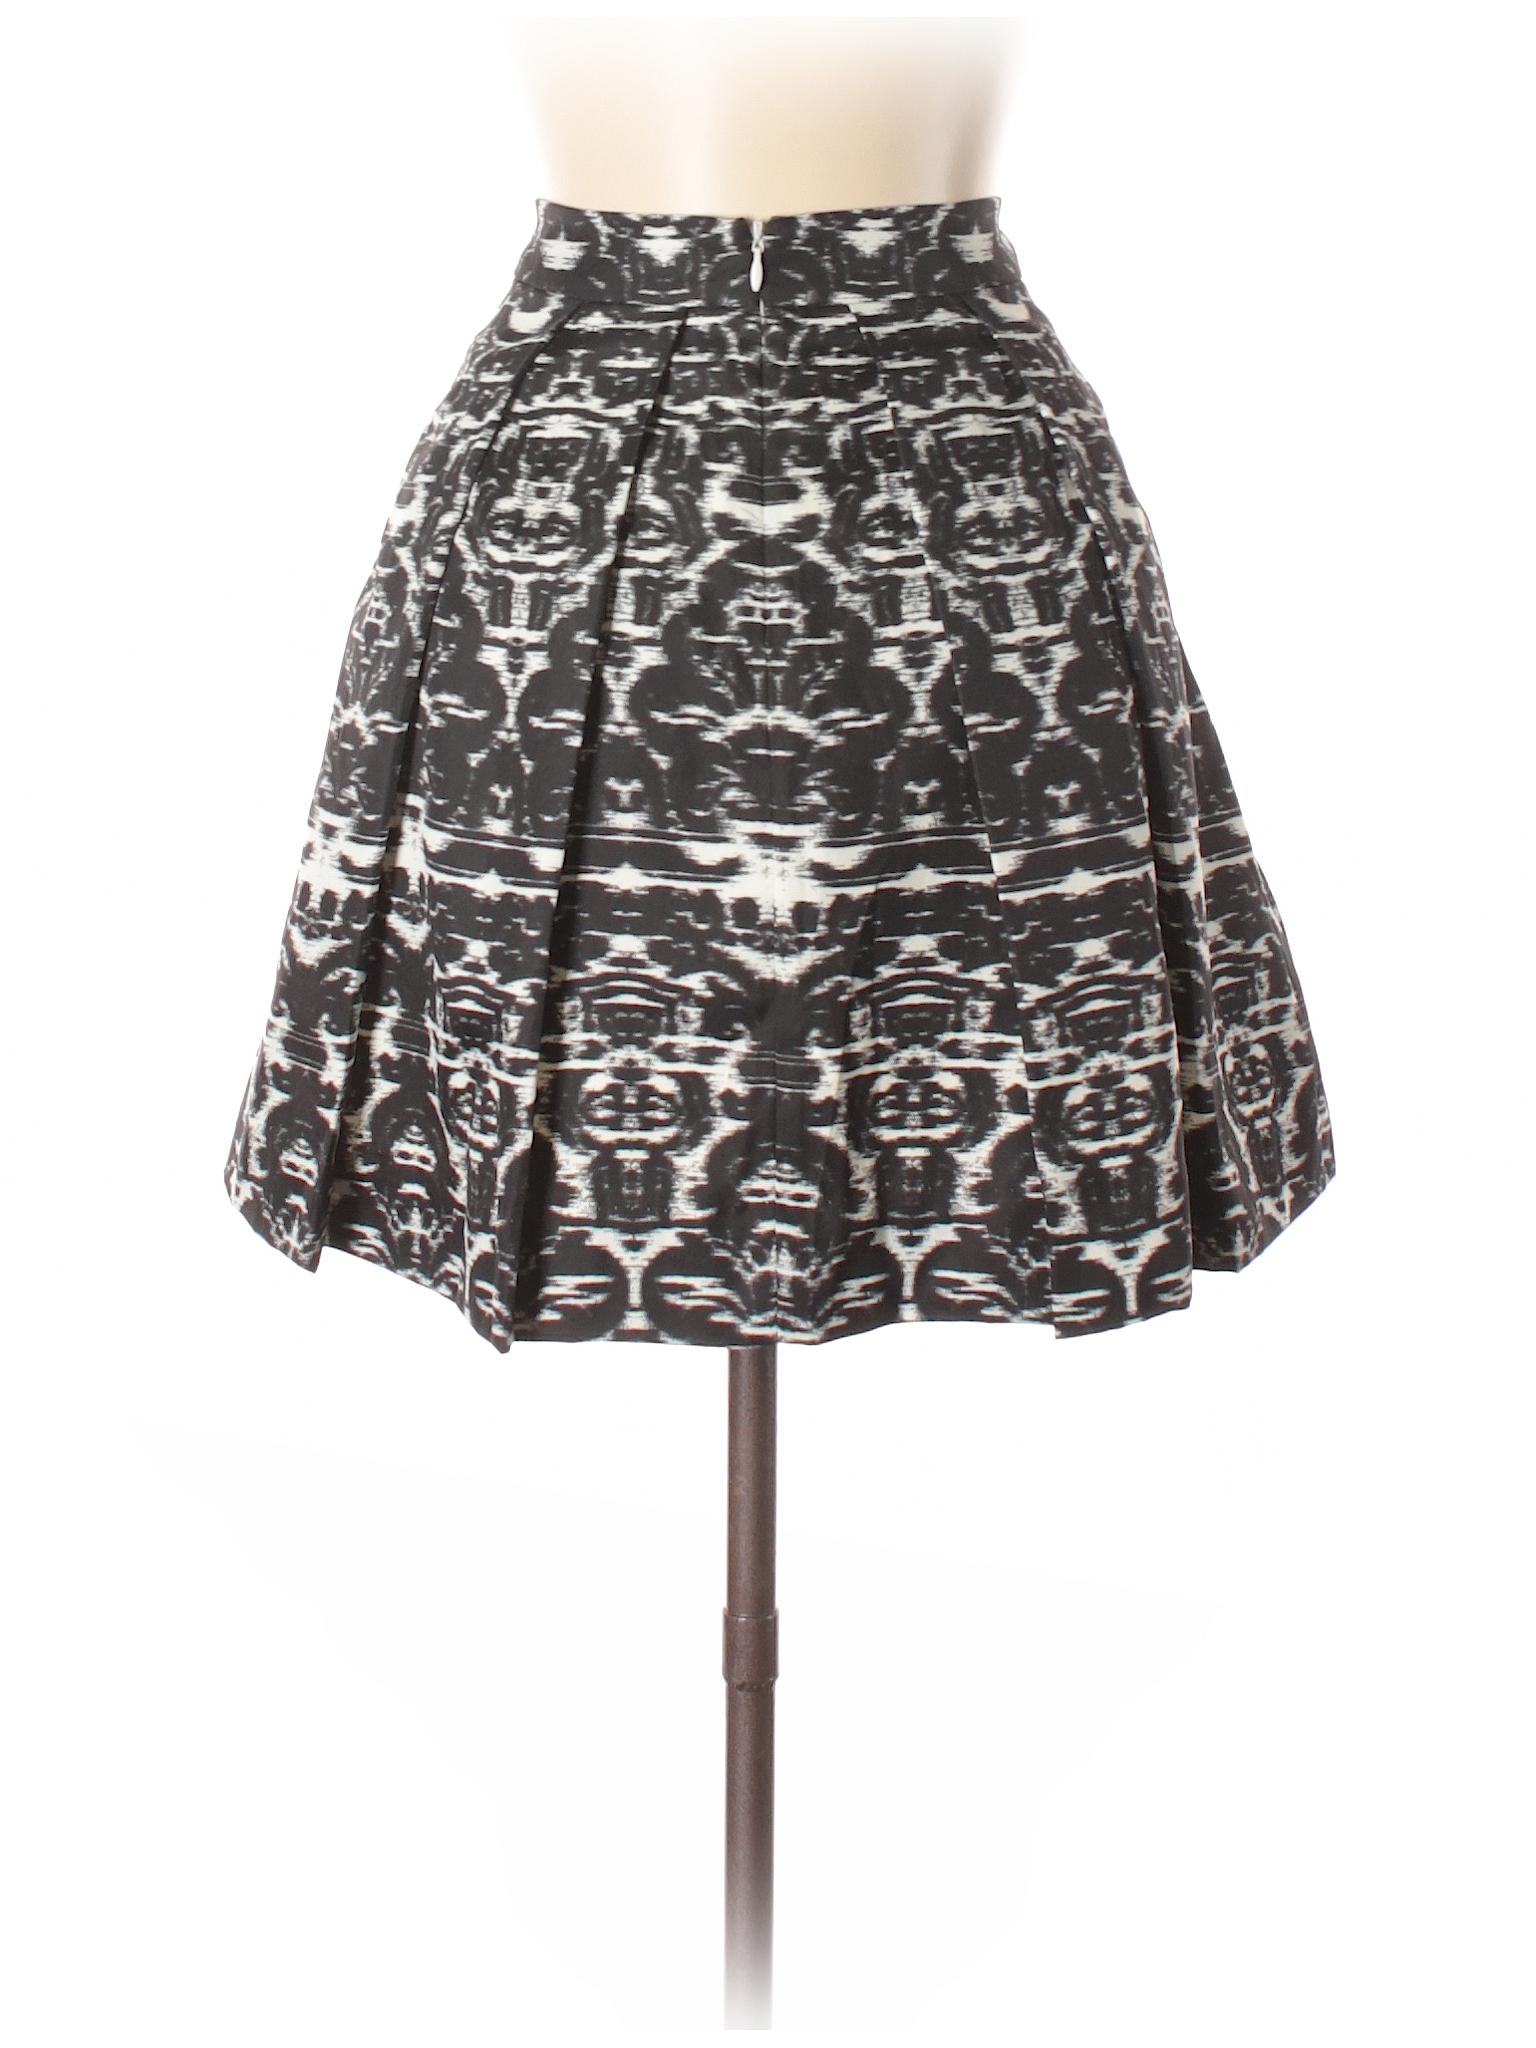 Boutique Boutique Skirt Casual Skirt Casual Casual Skirt Boutique Cwqnrw8XB